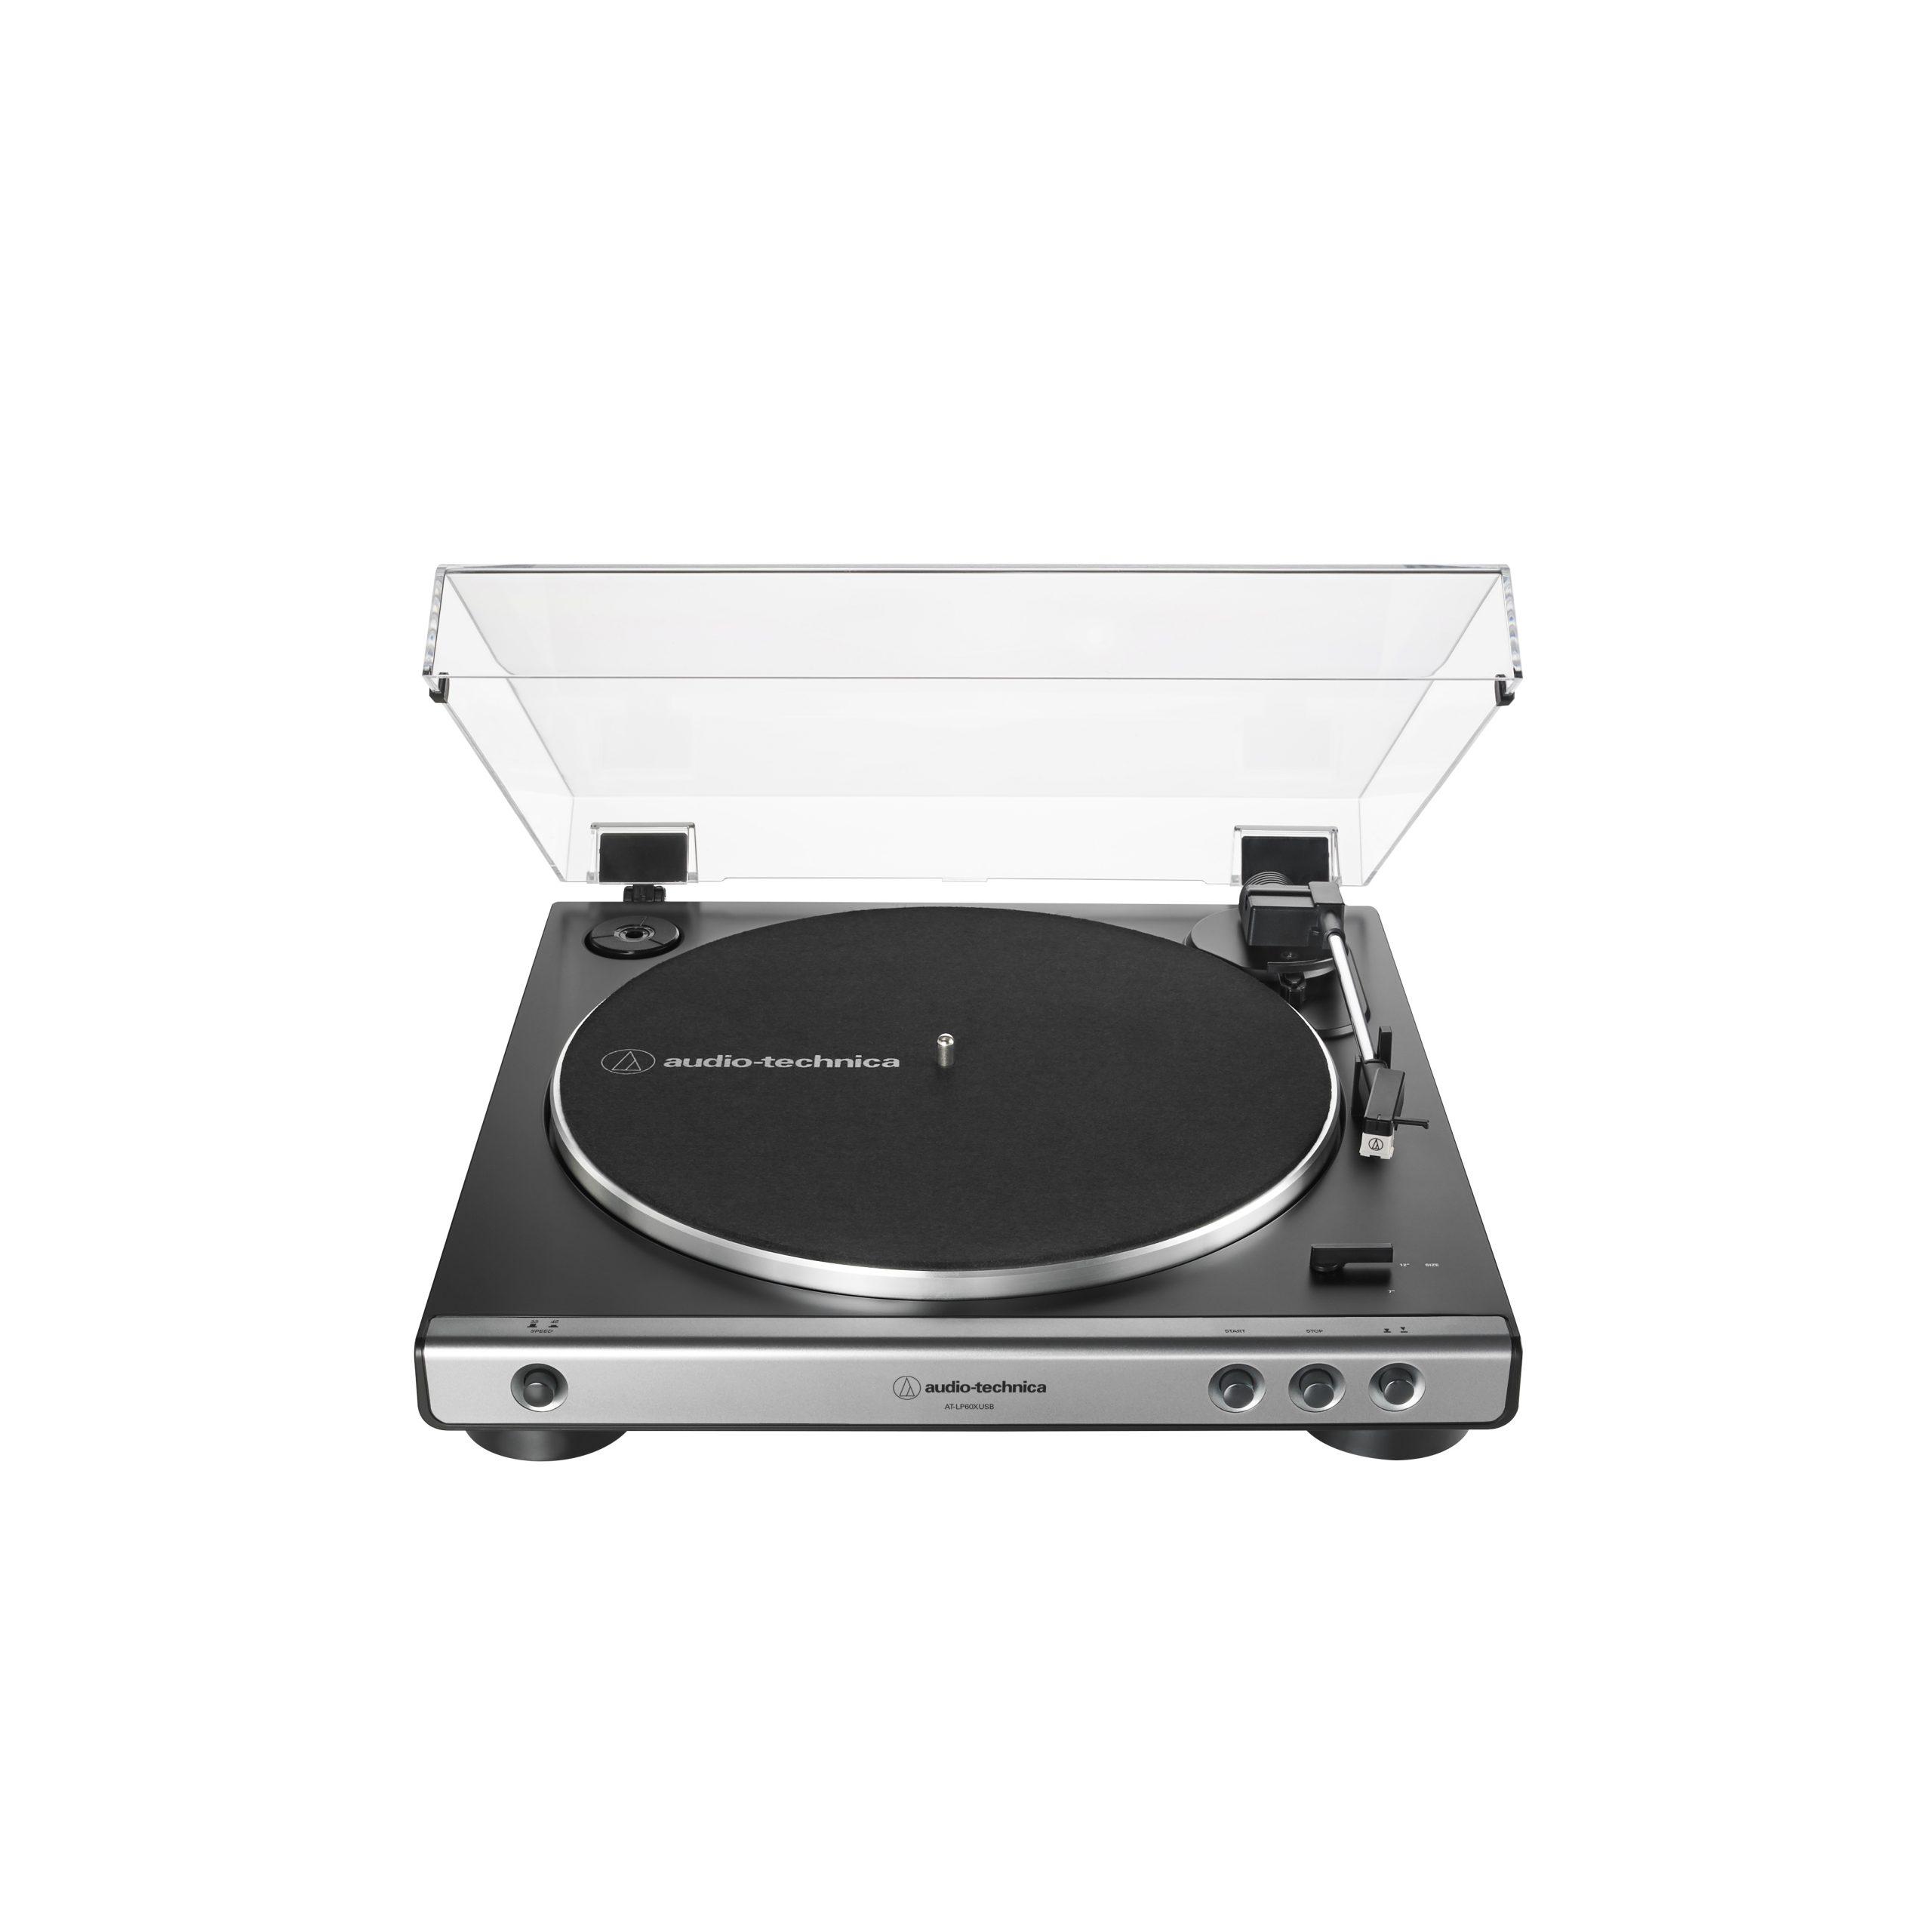 Best Audio Technica Turntable Singapore, Audio Technica AT-LP60X, Vinyl Player